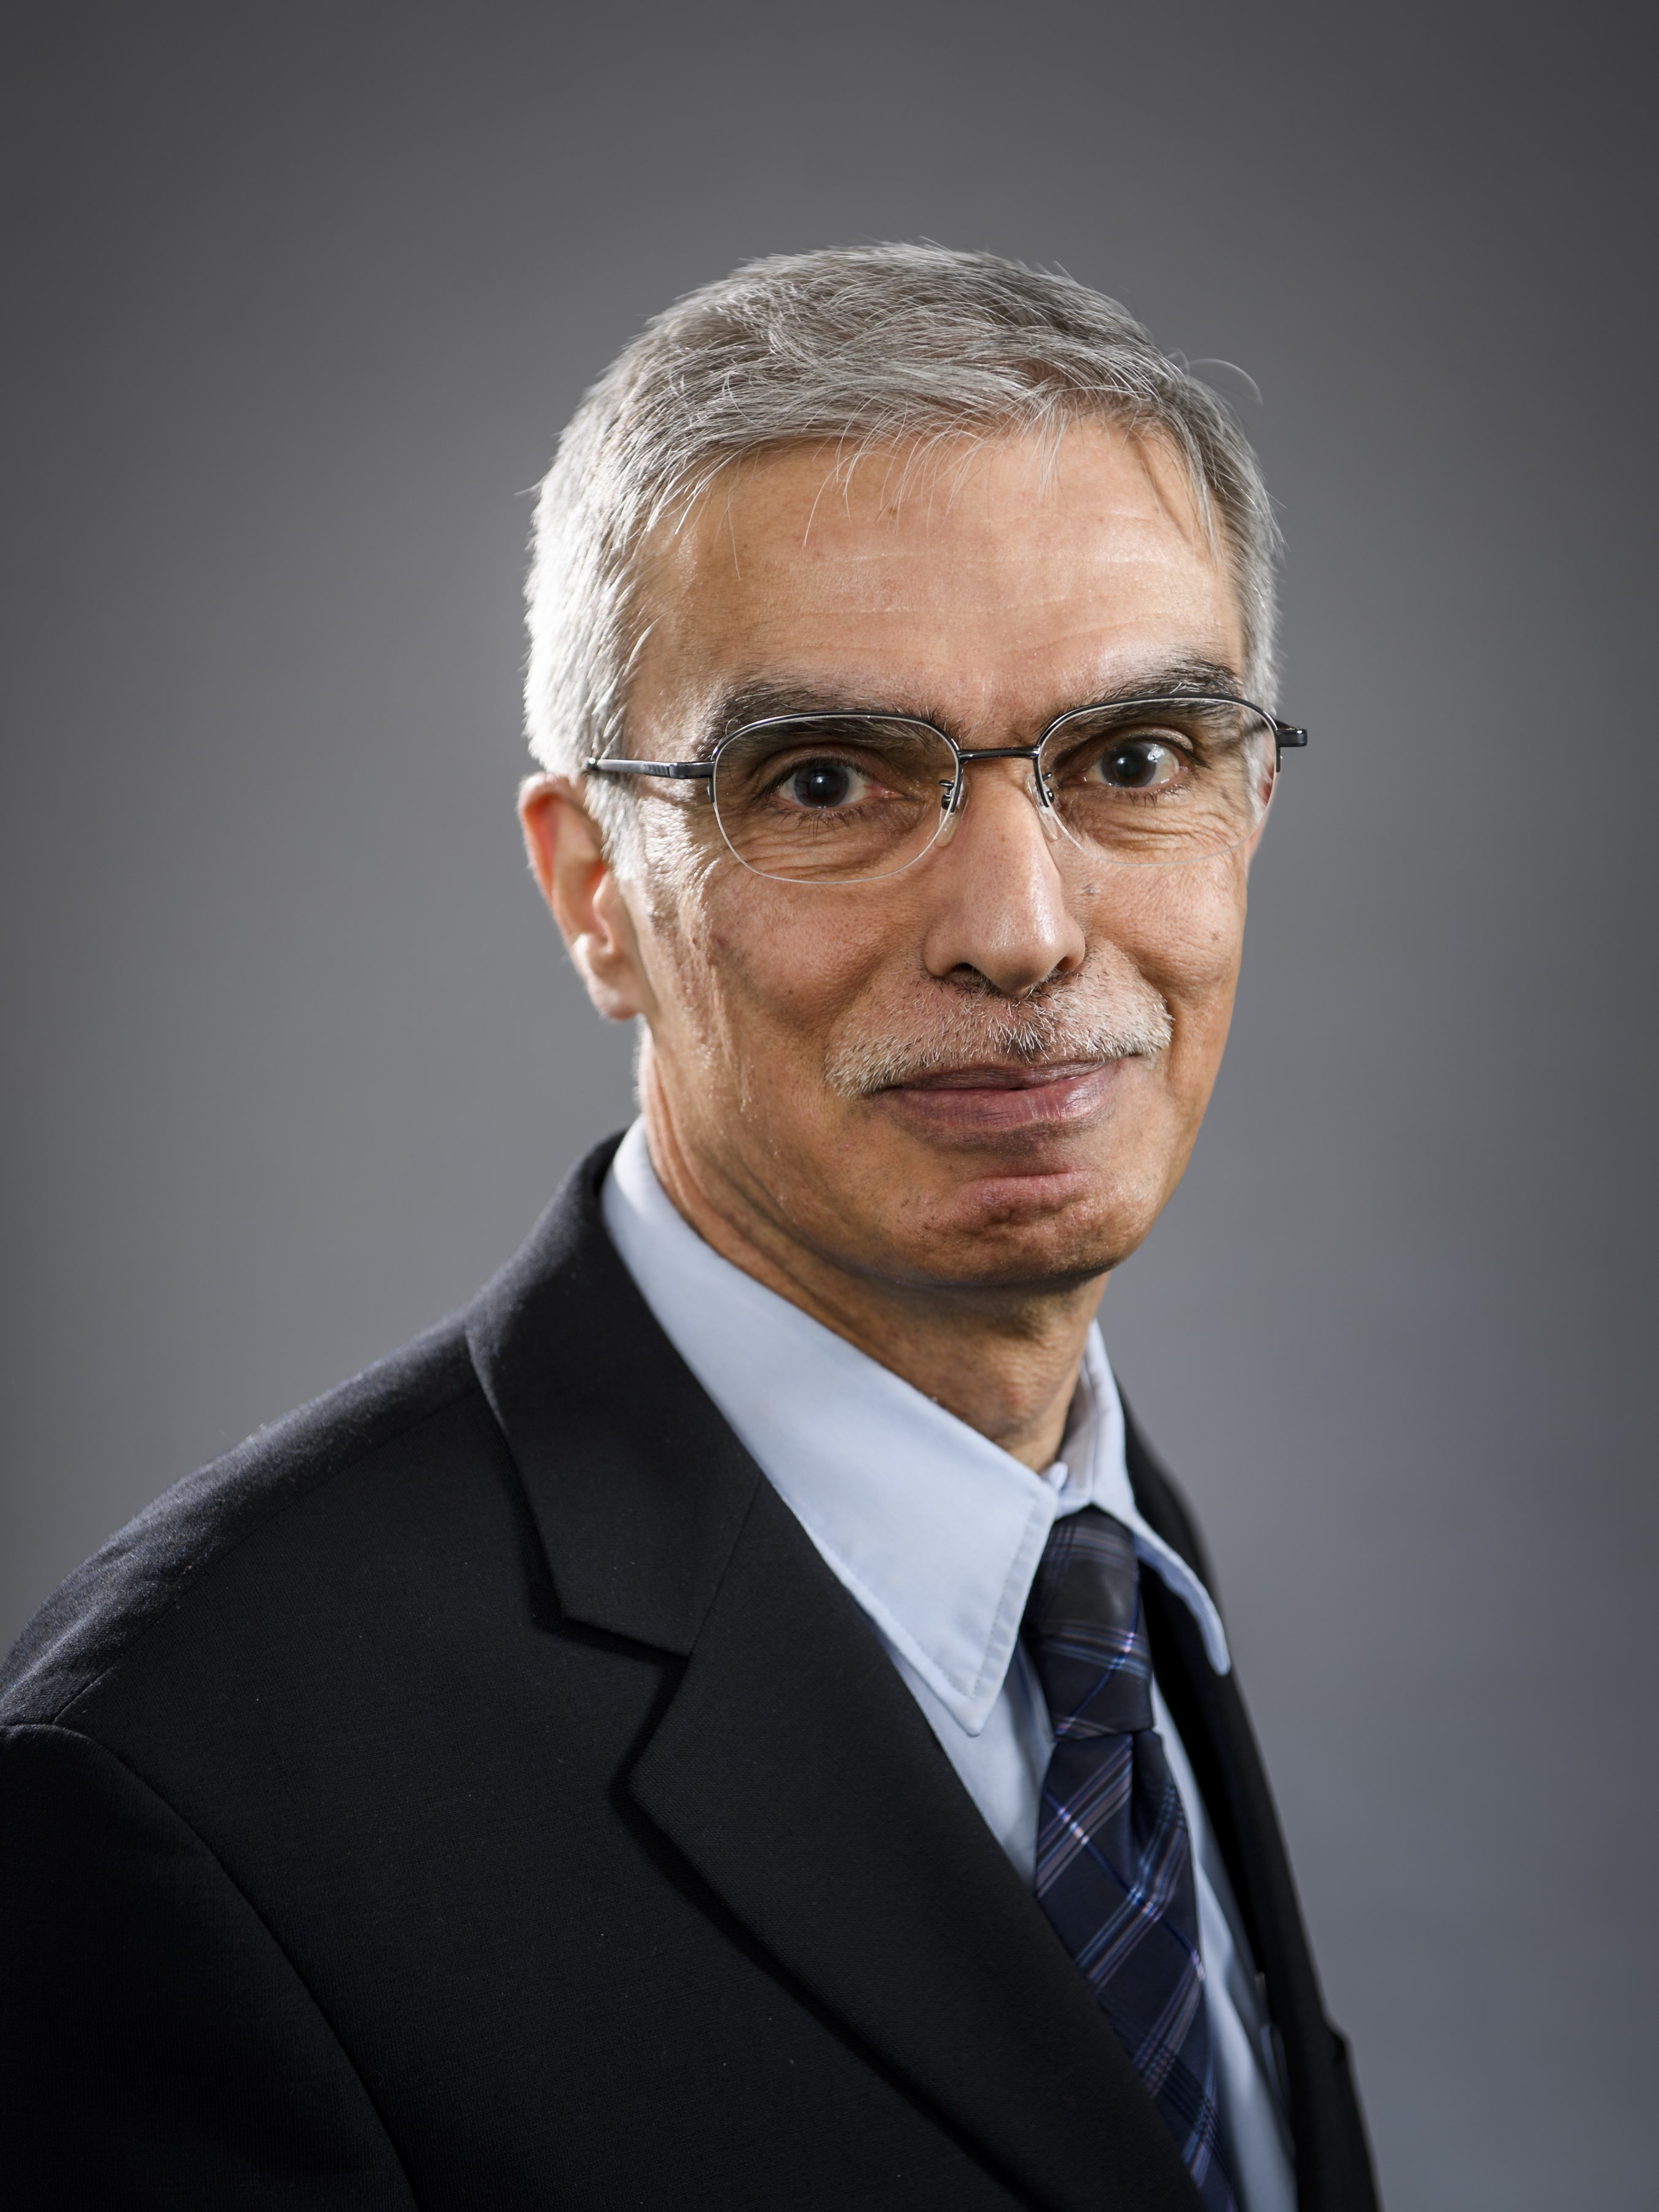 Mohammad Ghavami